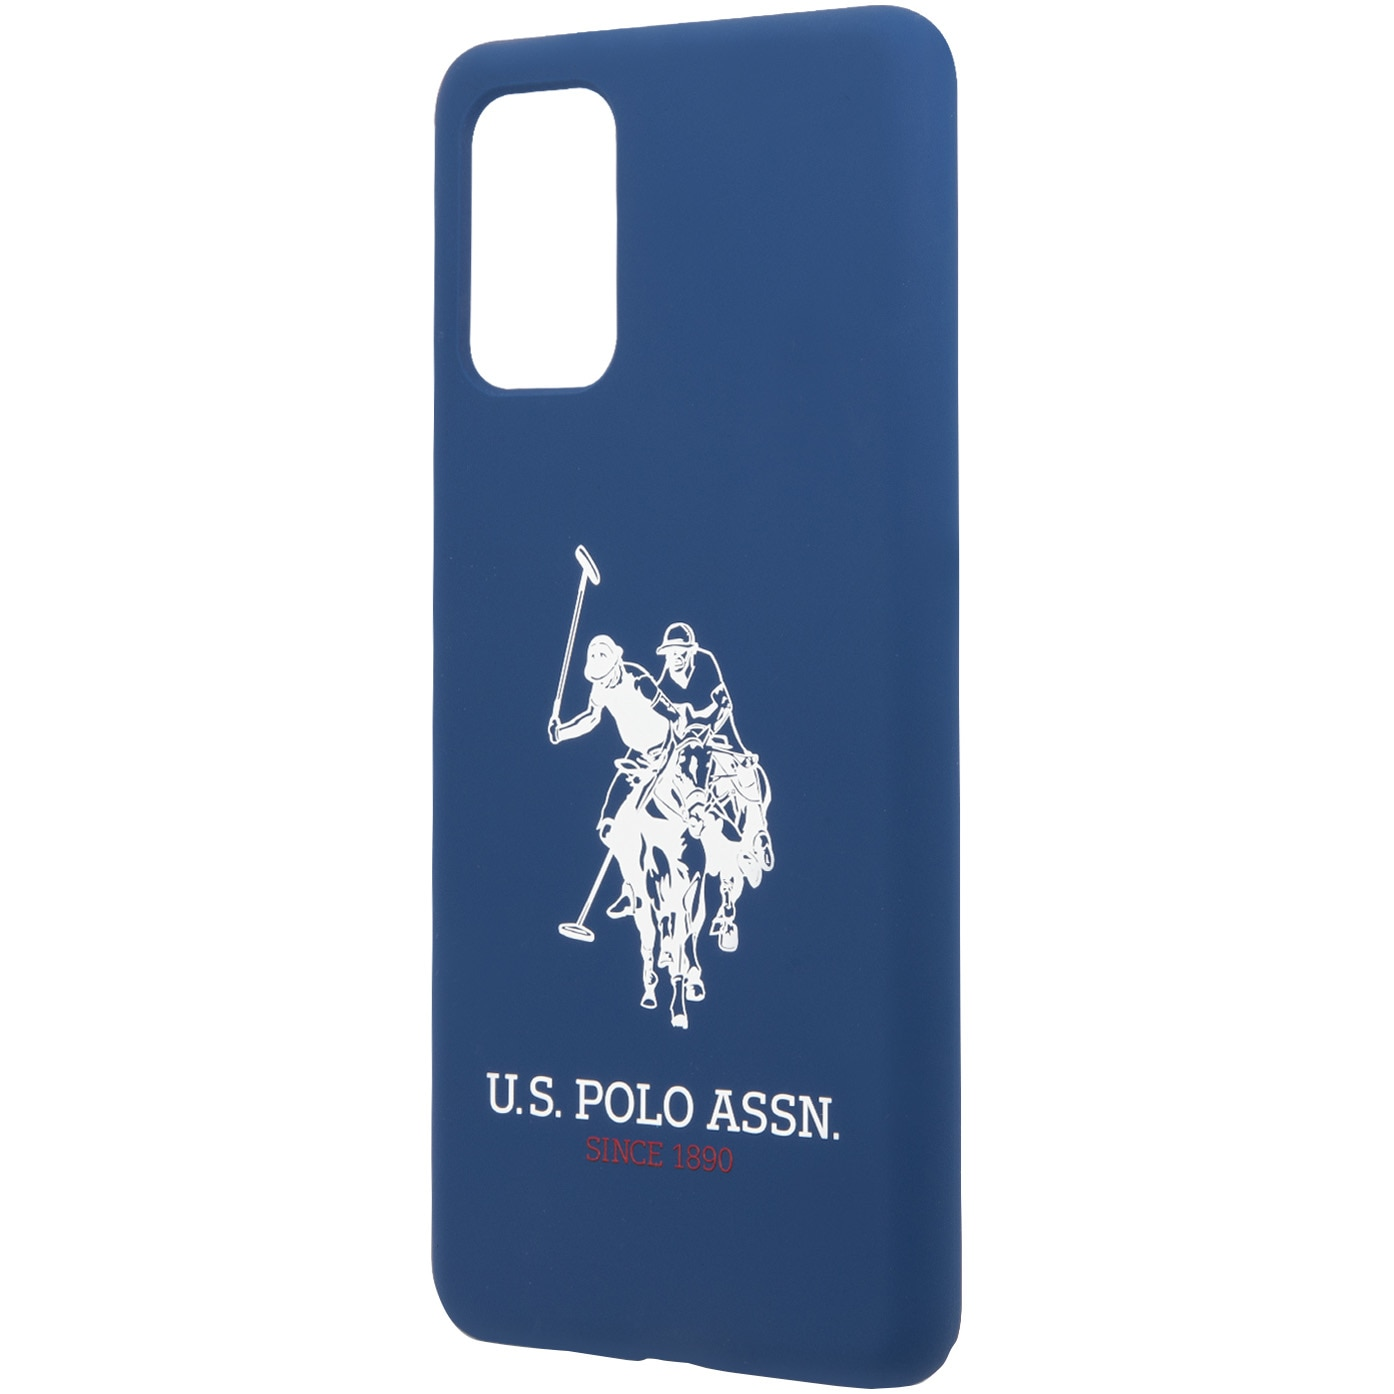 Fotografie Husa de protectie US Polo Silicone pentru Samsung Galaxy S20 Plus, Blue